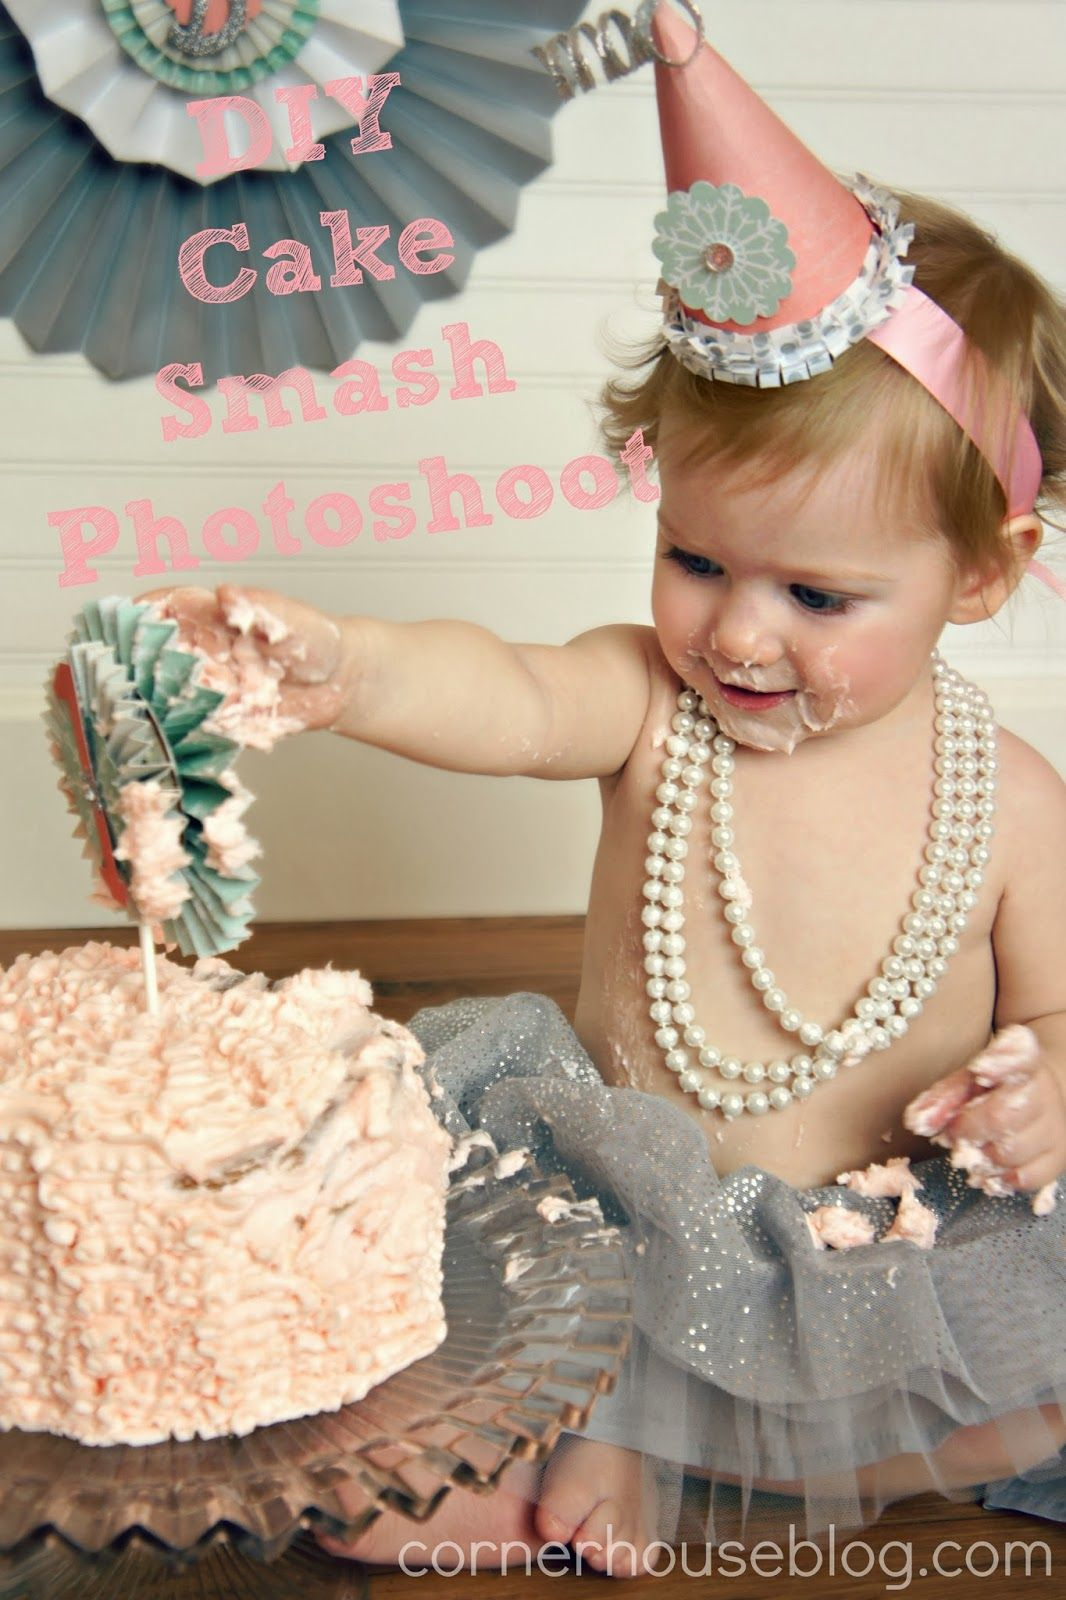 Bonnie's Winter ONEderland Cake Smash Photo Shoot DIY